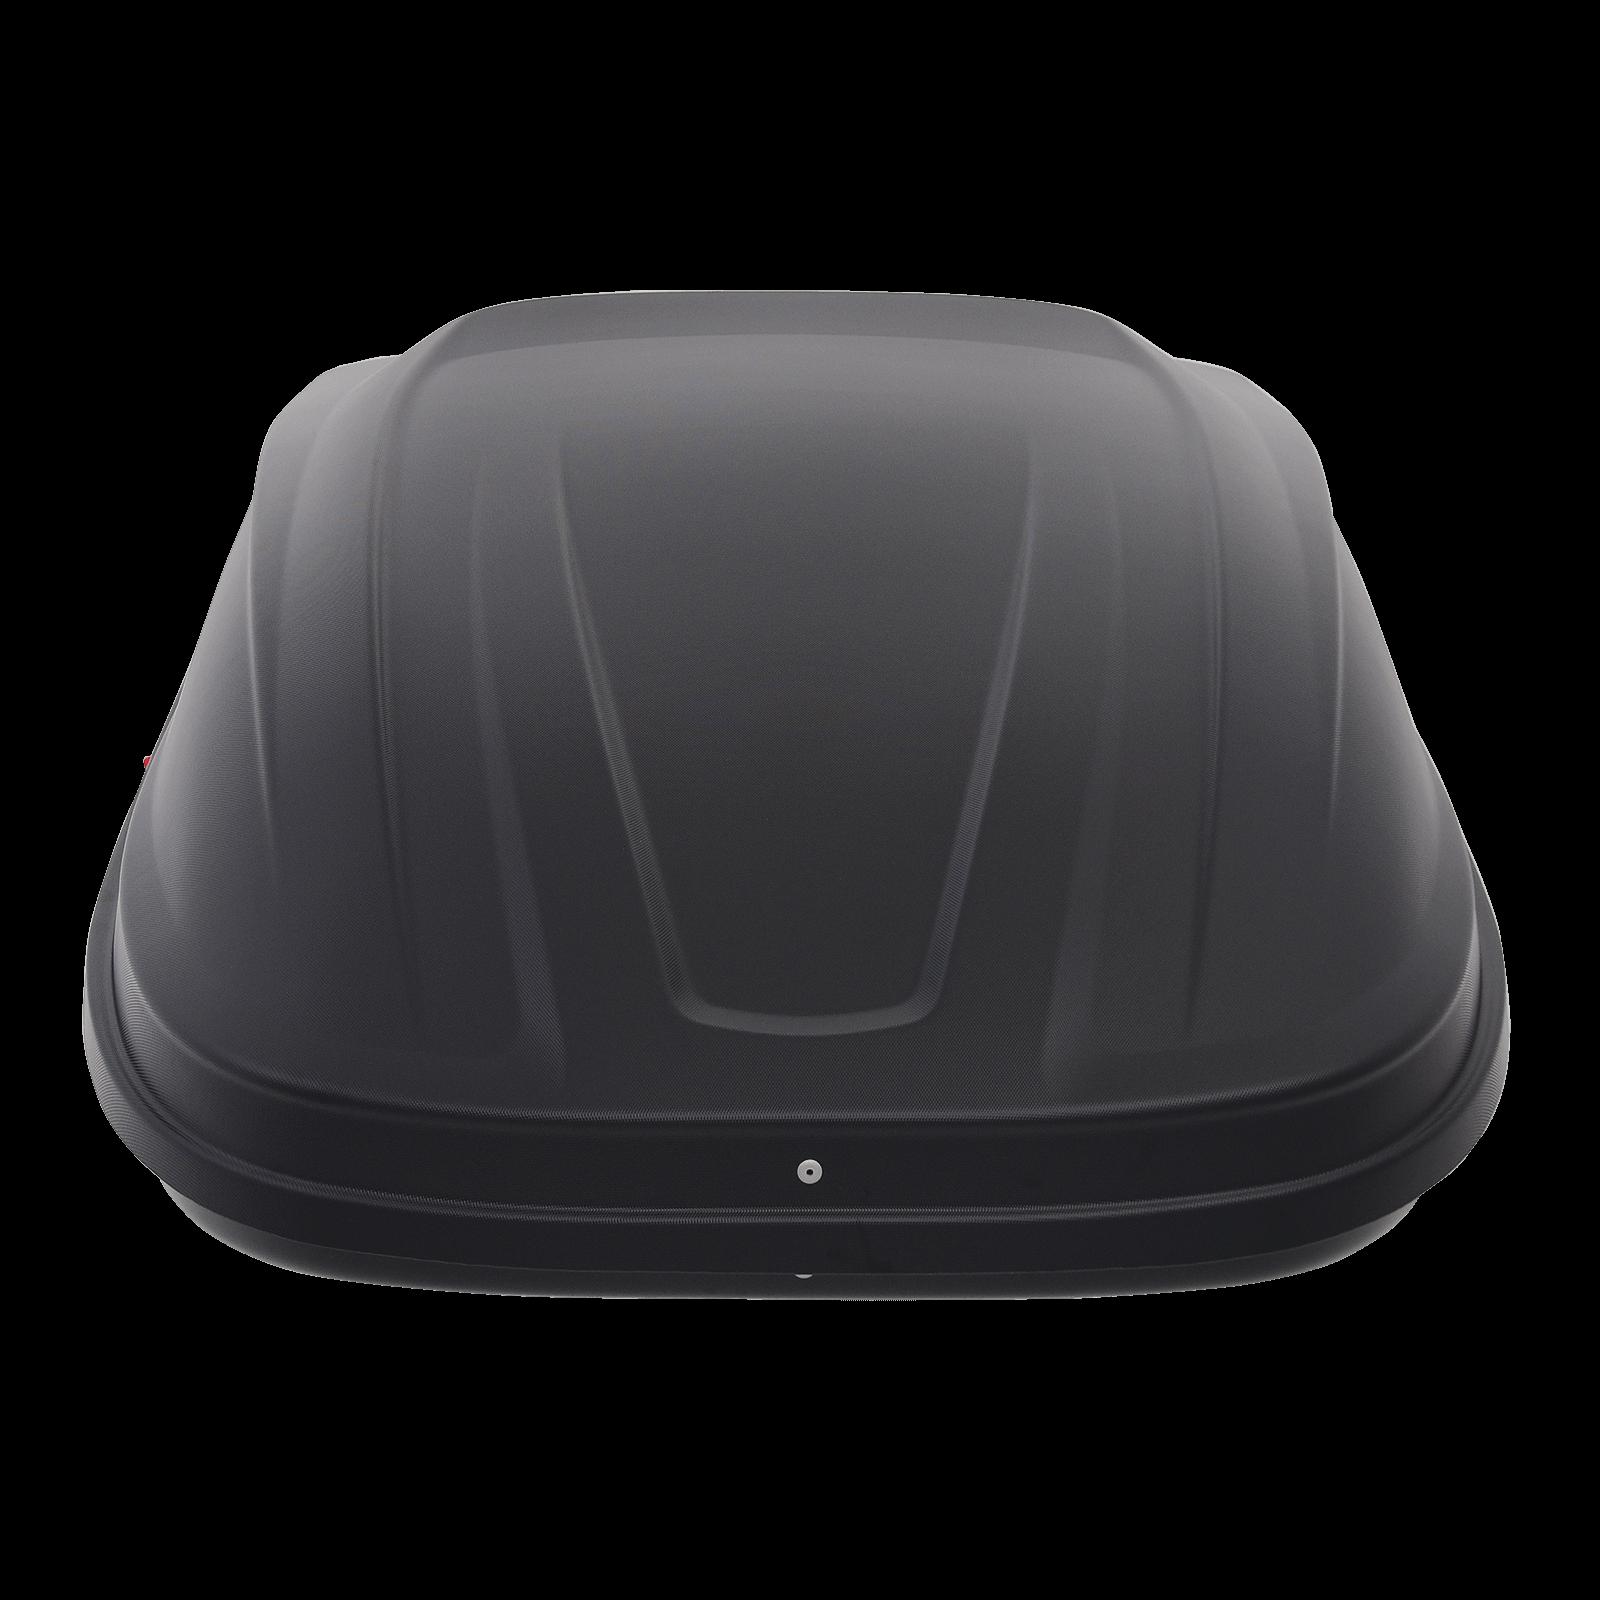 Dachbox G3 Spark 520 schwarz matt - Bild 3